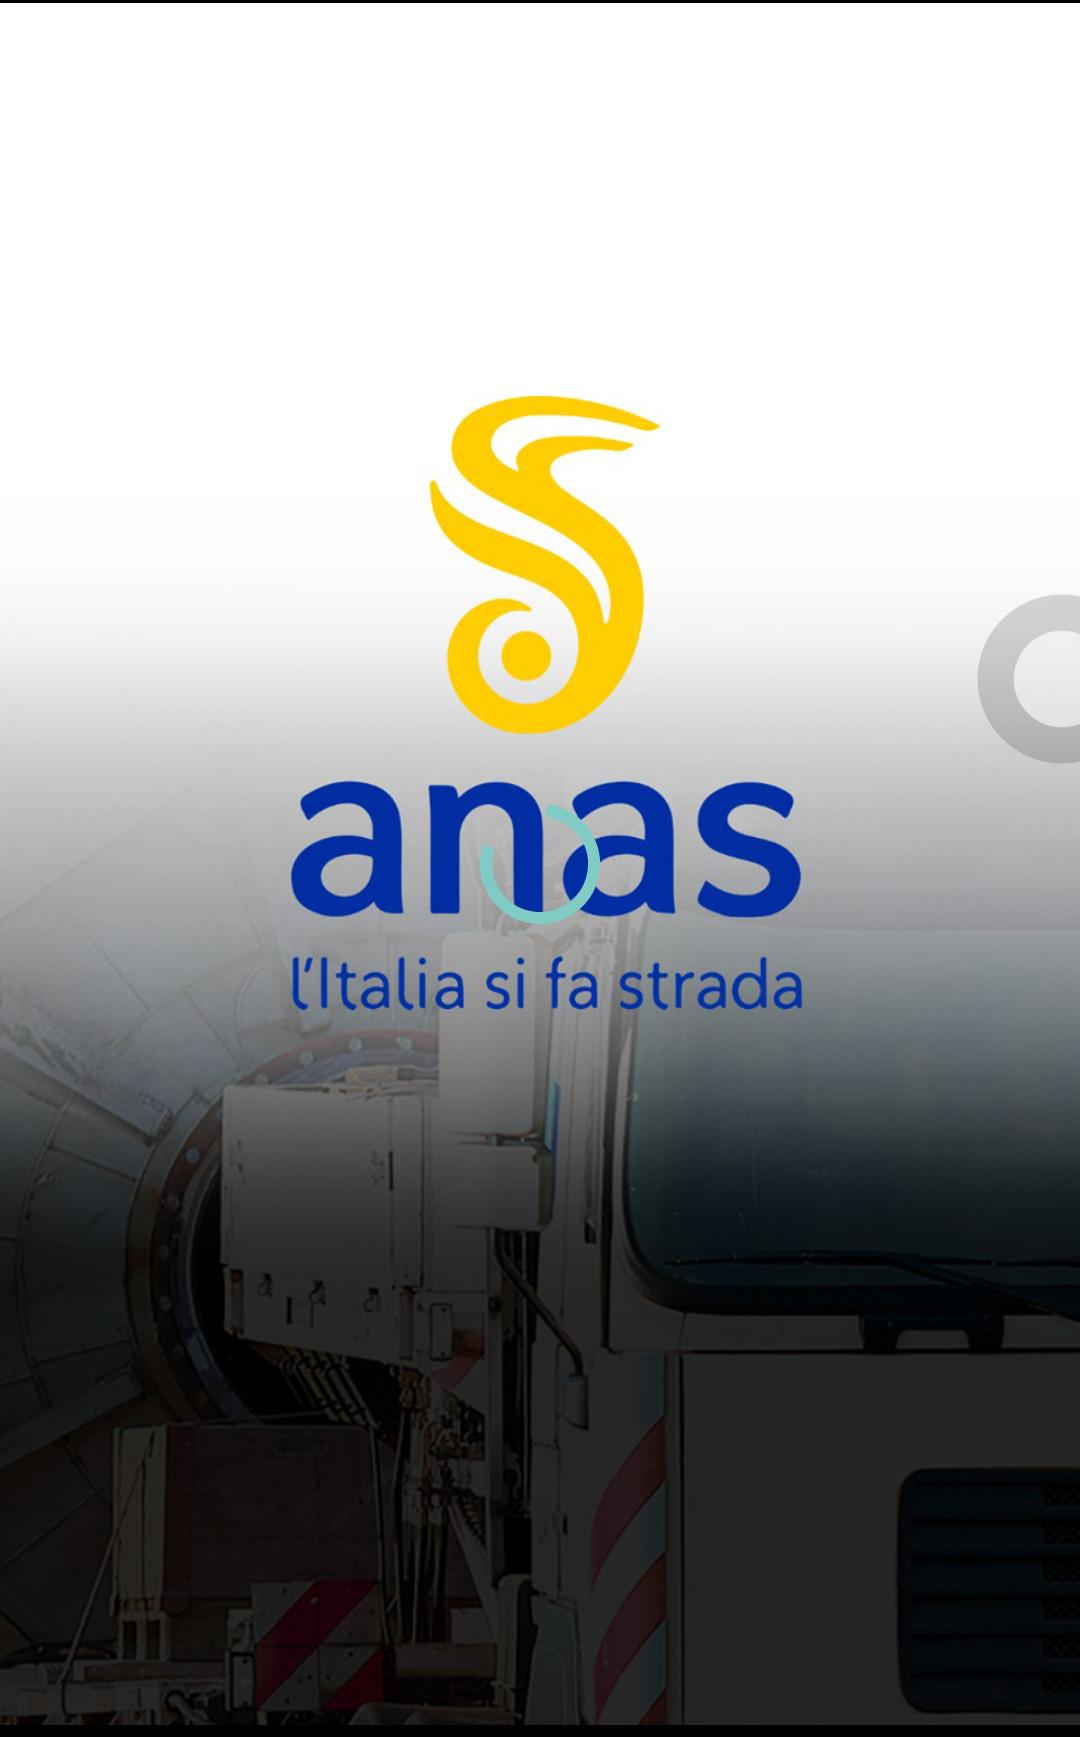 https://www.ploseate.com/2854/Anas-Teweb-app-frontpage.jpg